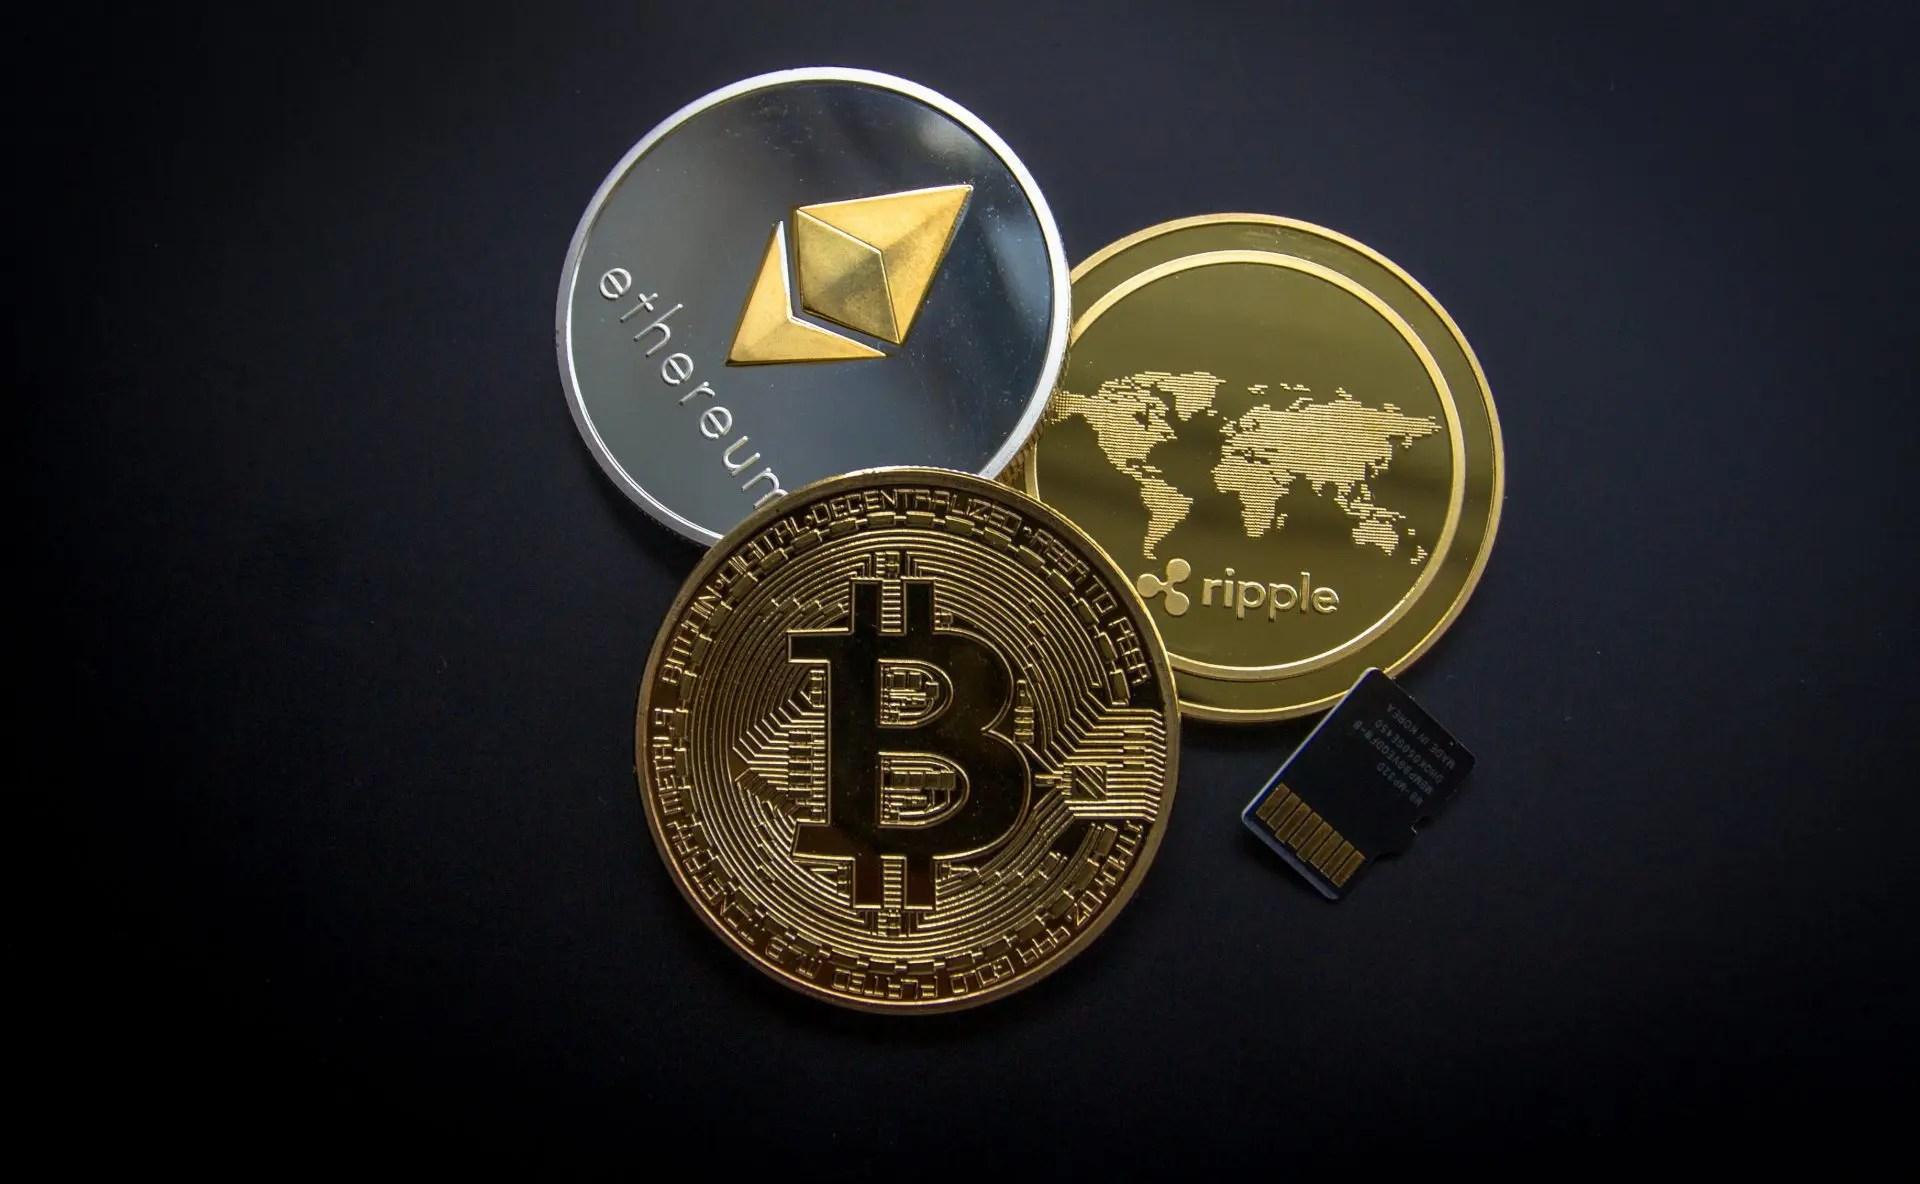 DMG Blockchain